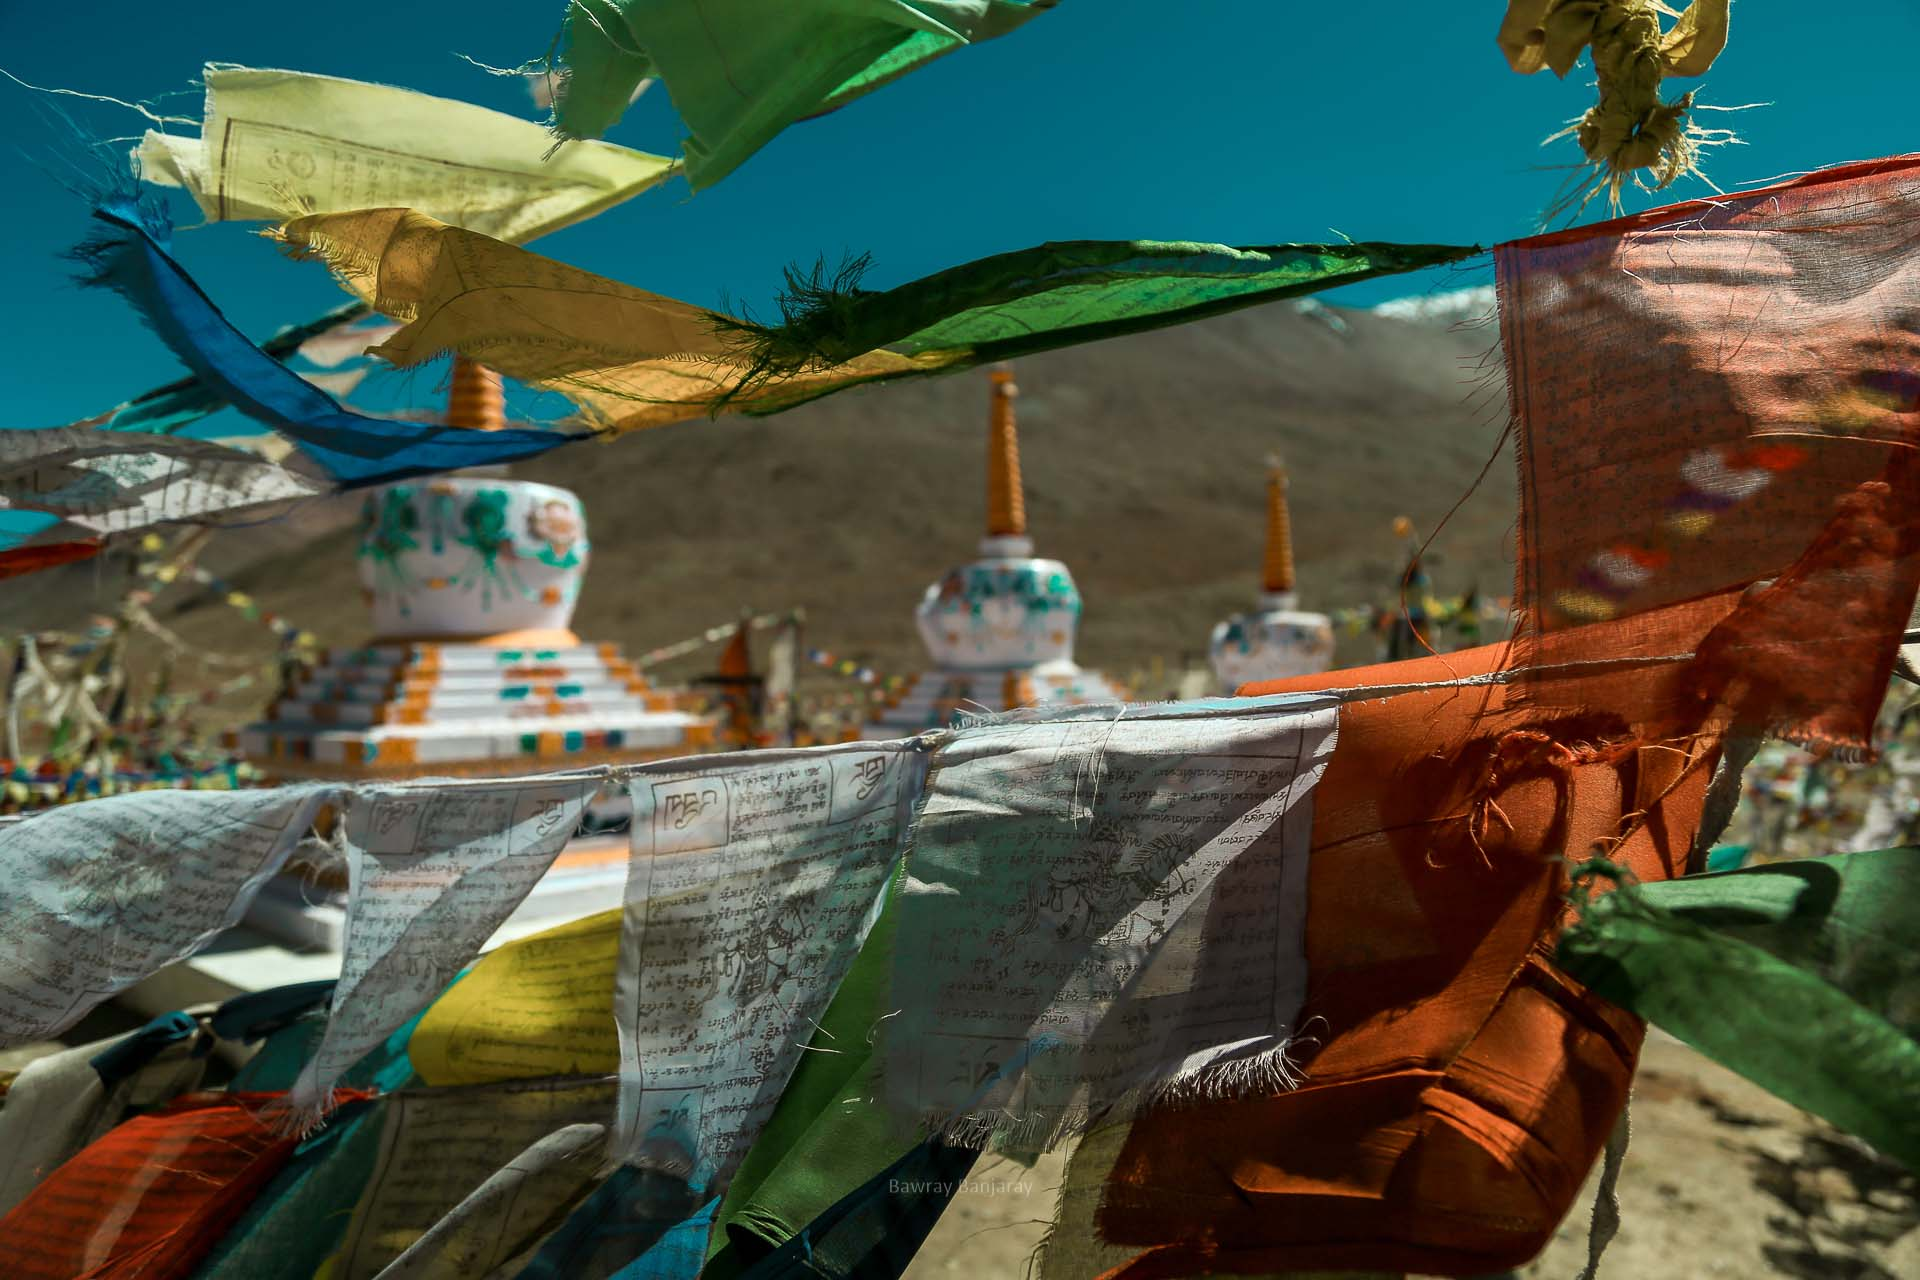 The BUddhist structures at the Kunzum Mata Temple